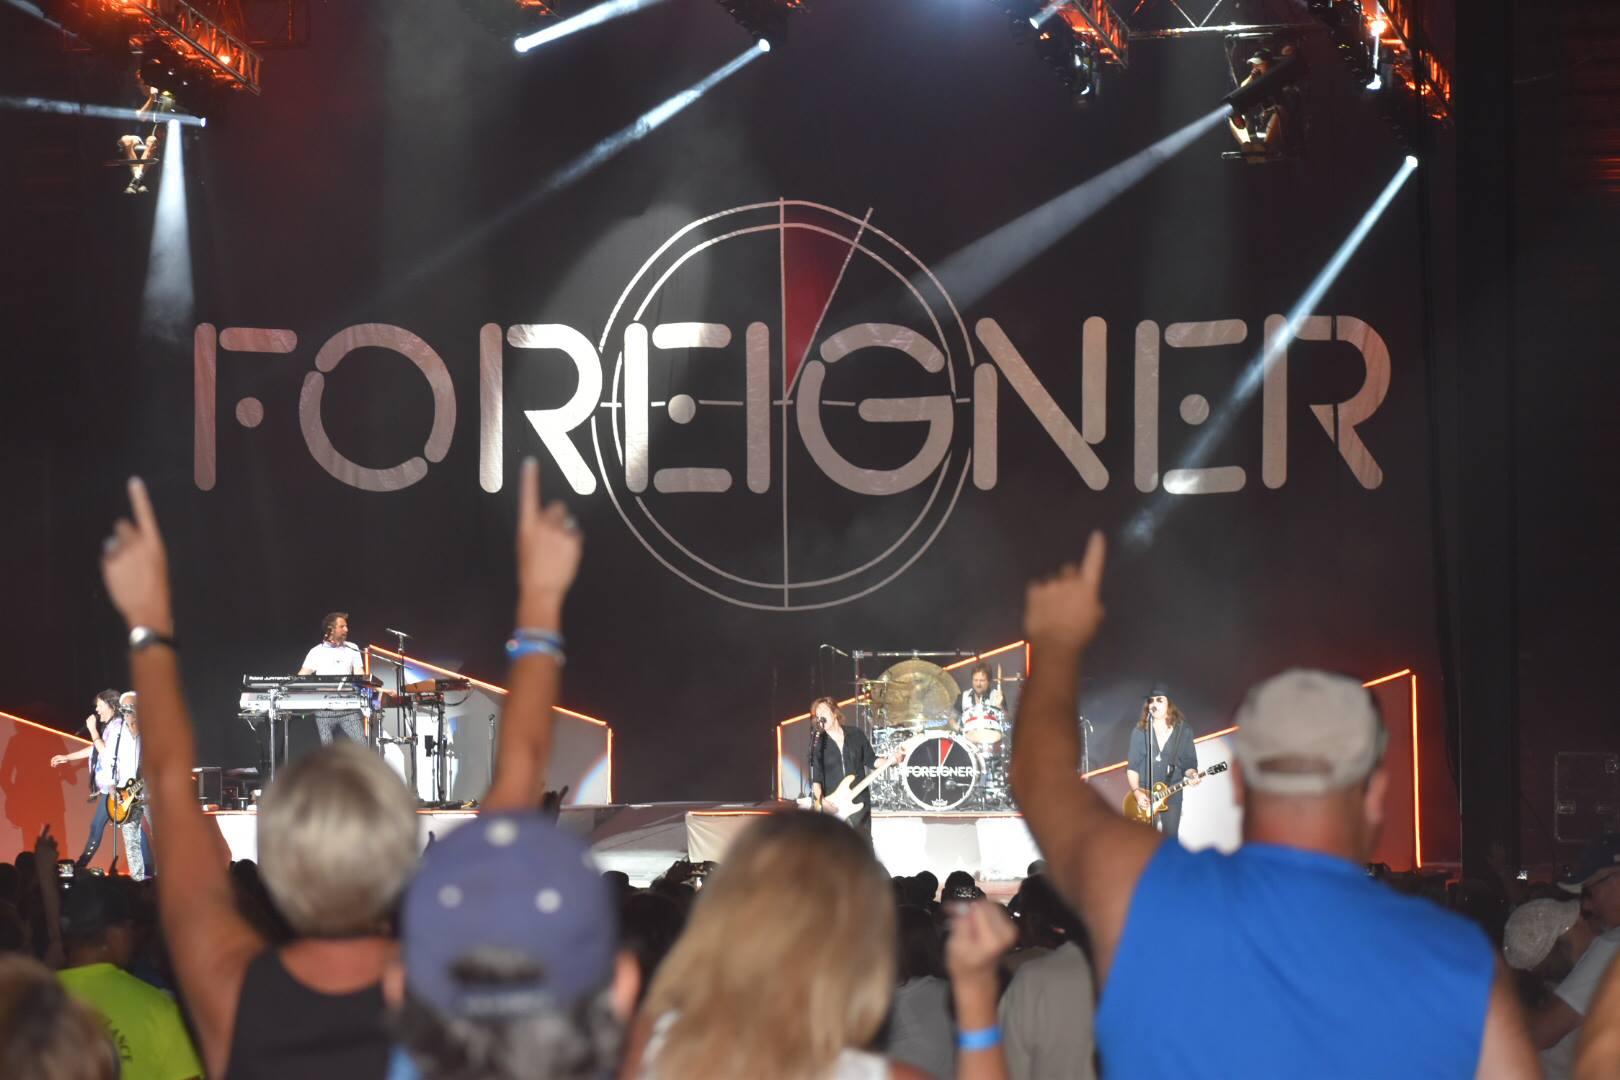 Foreigner 1